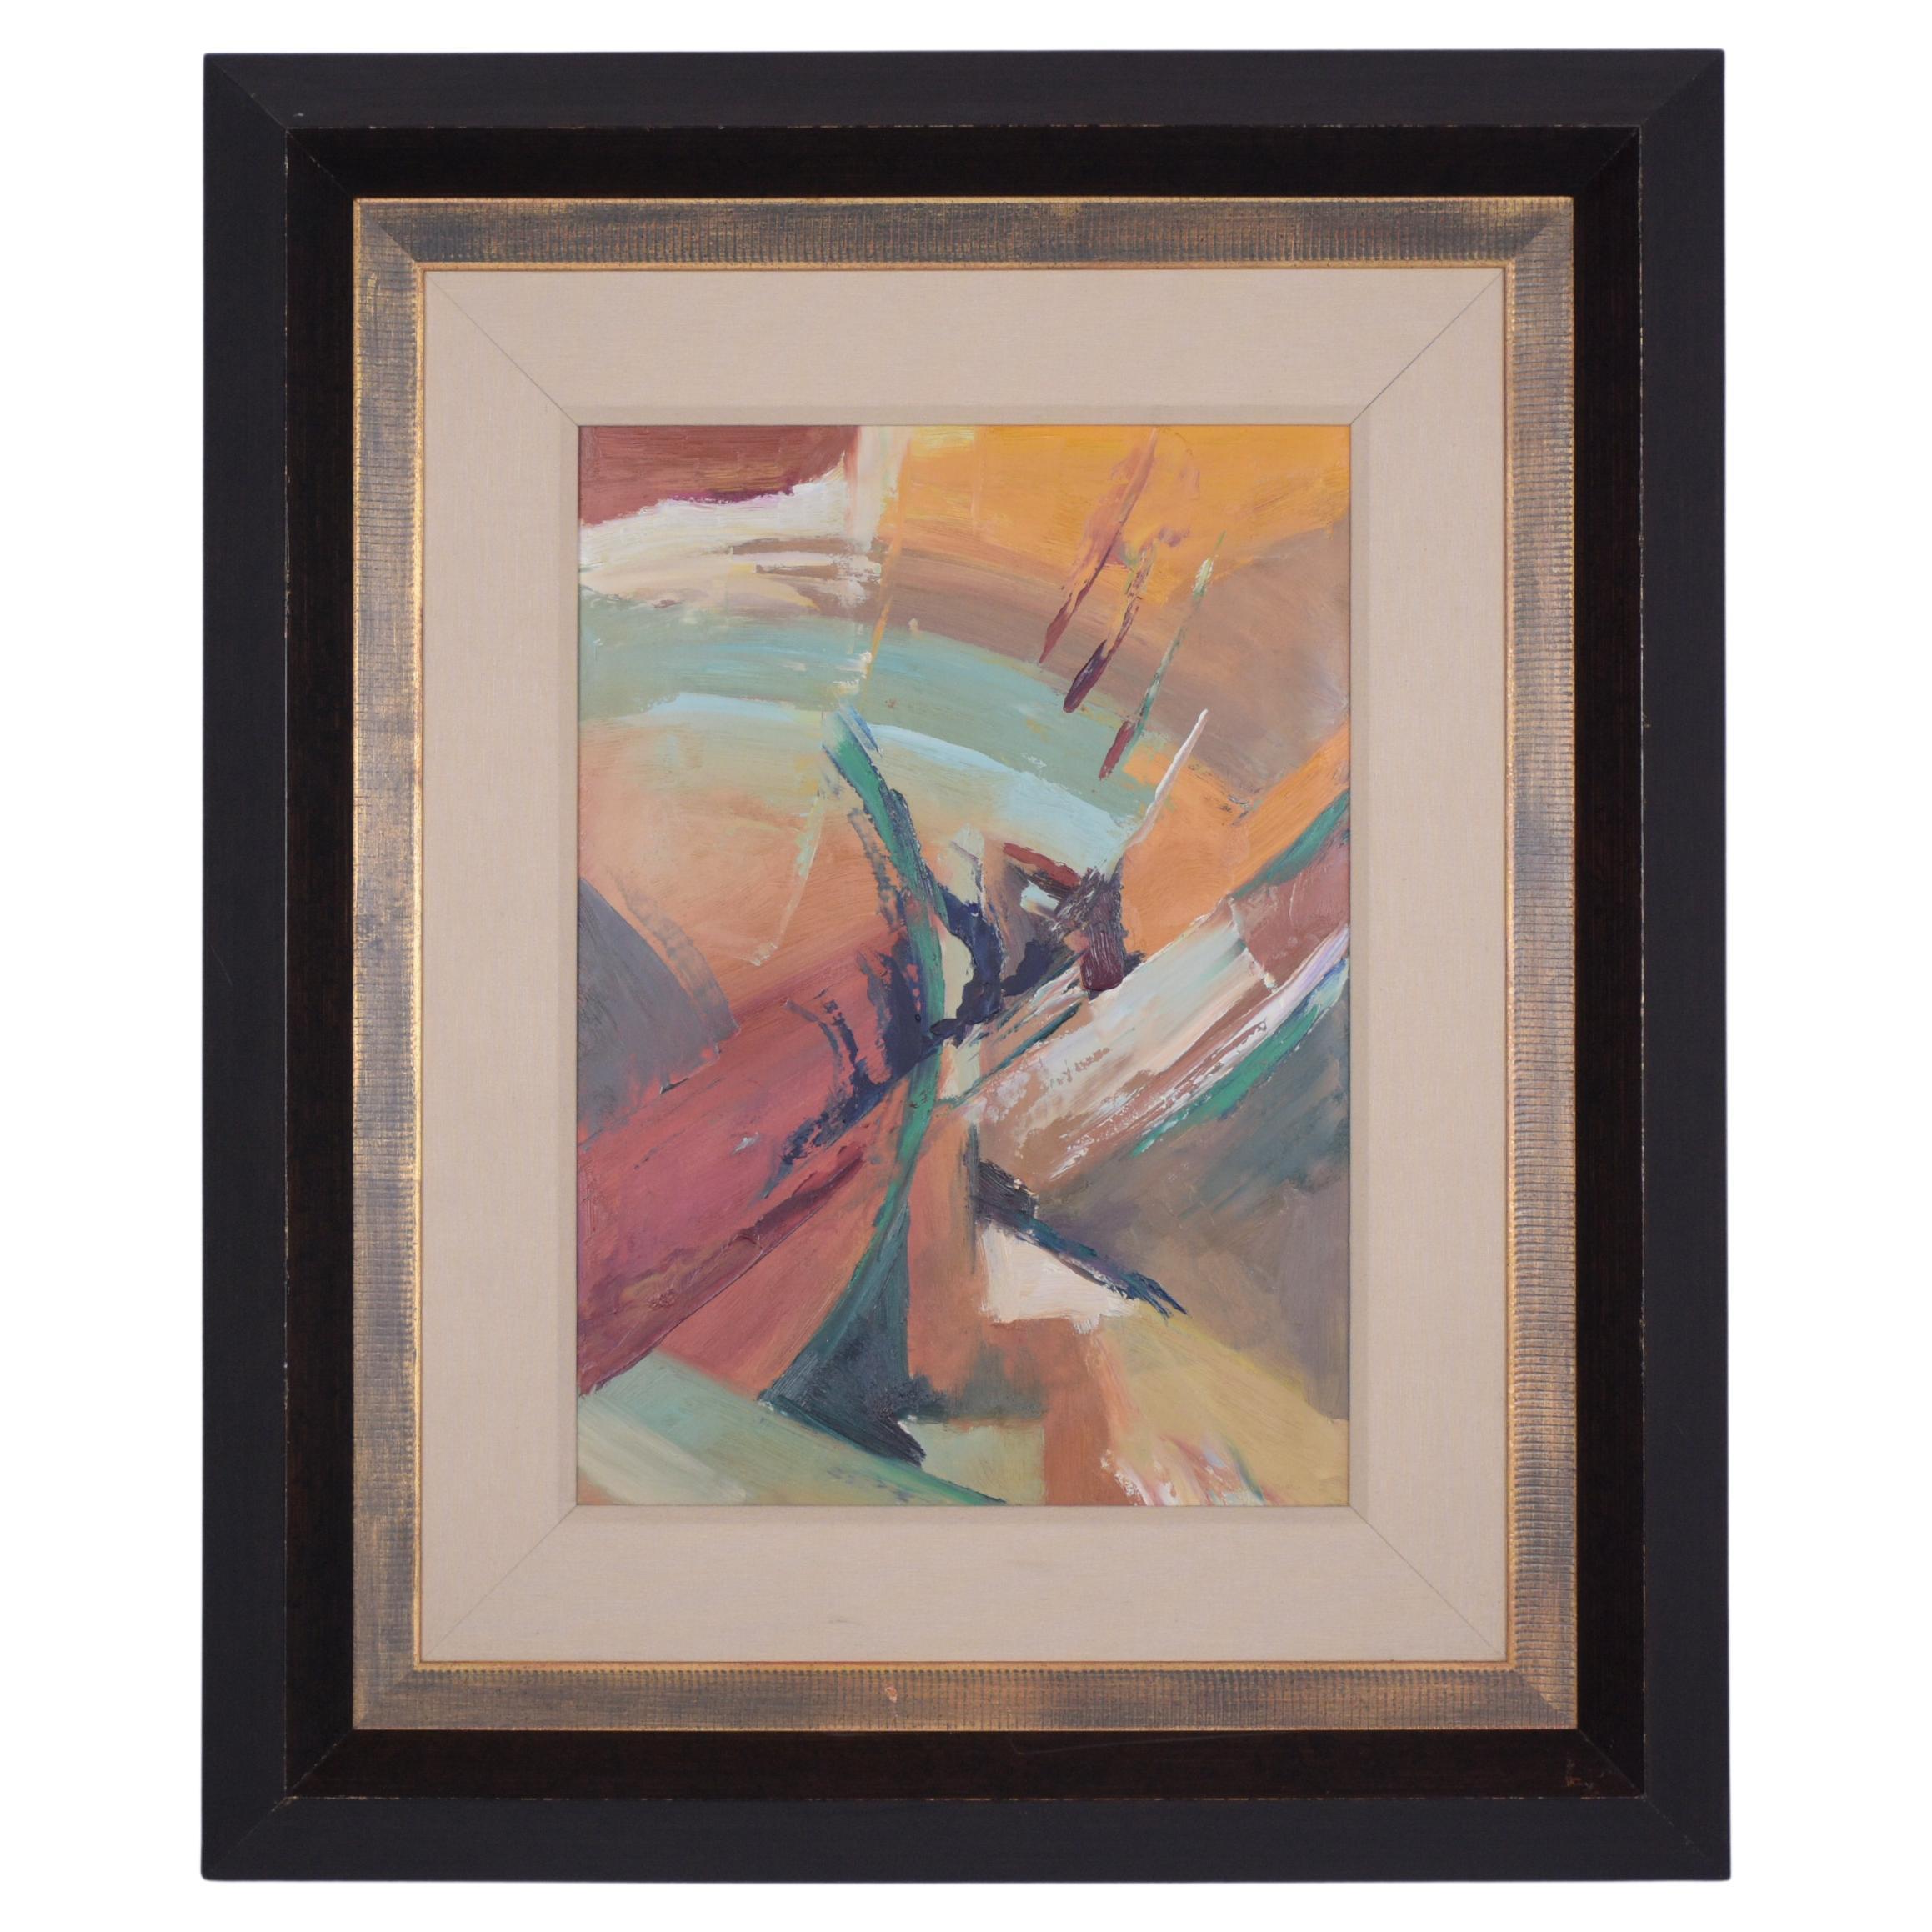 21th Century Framed Contemporary Art Acrylic Painting